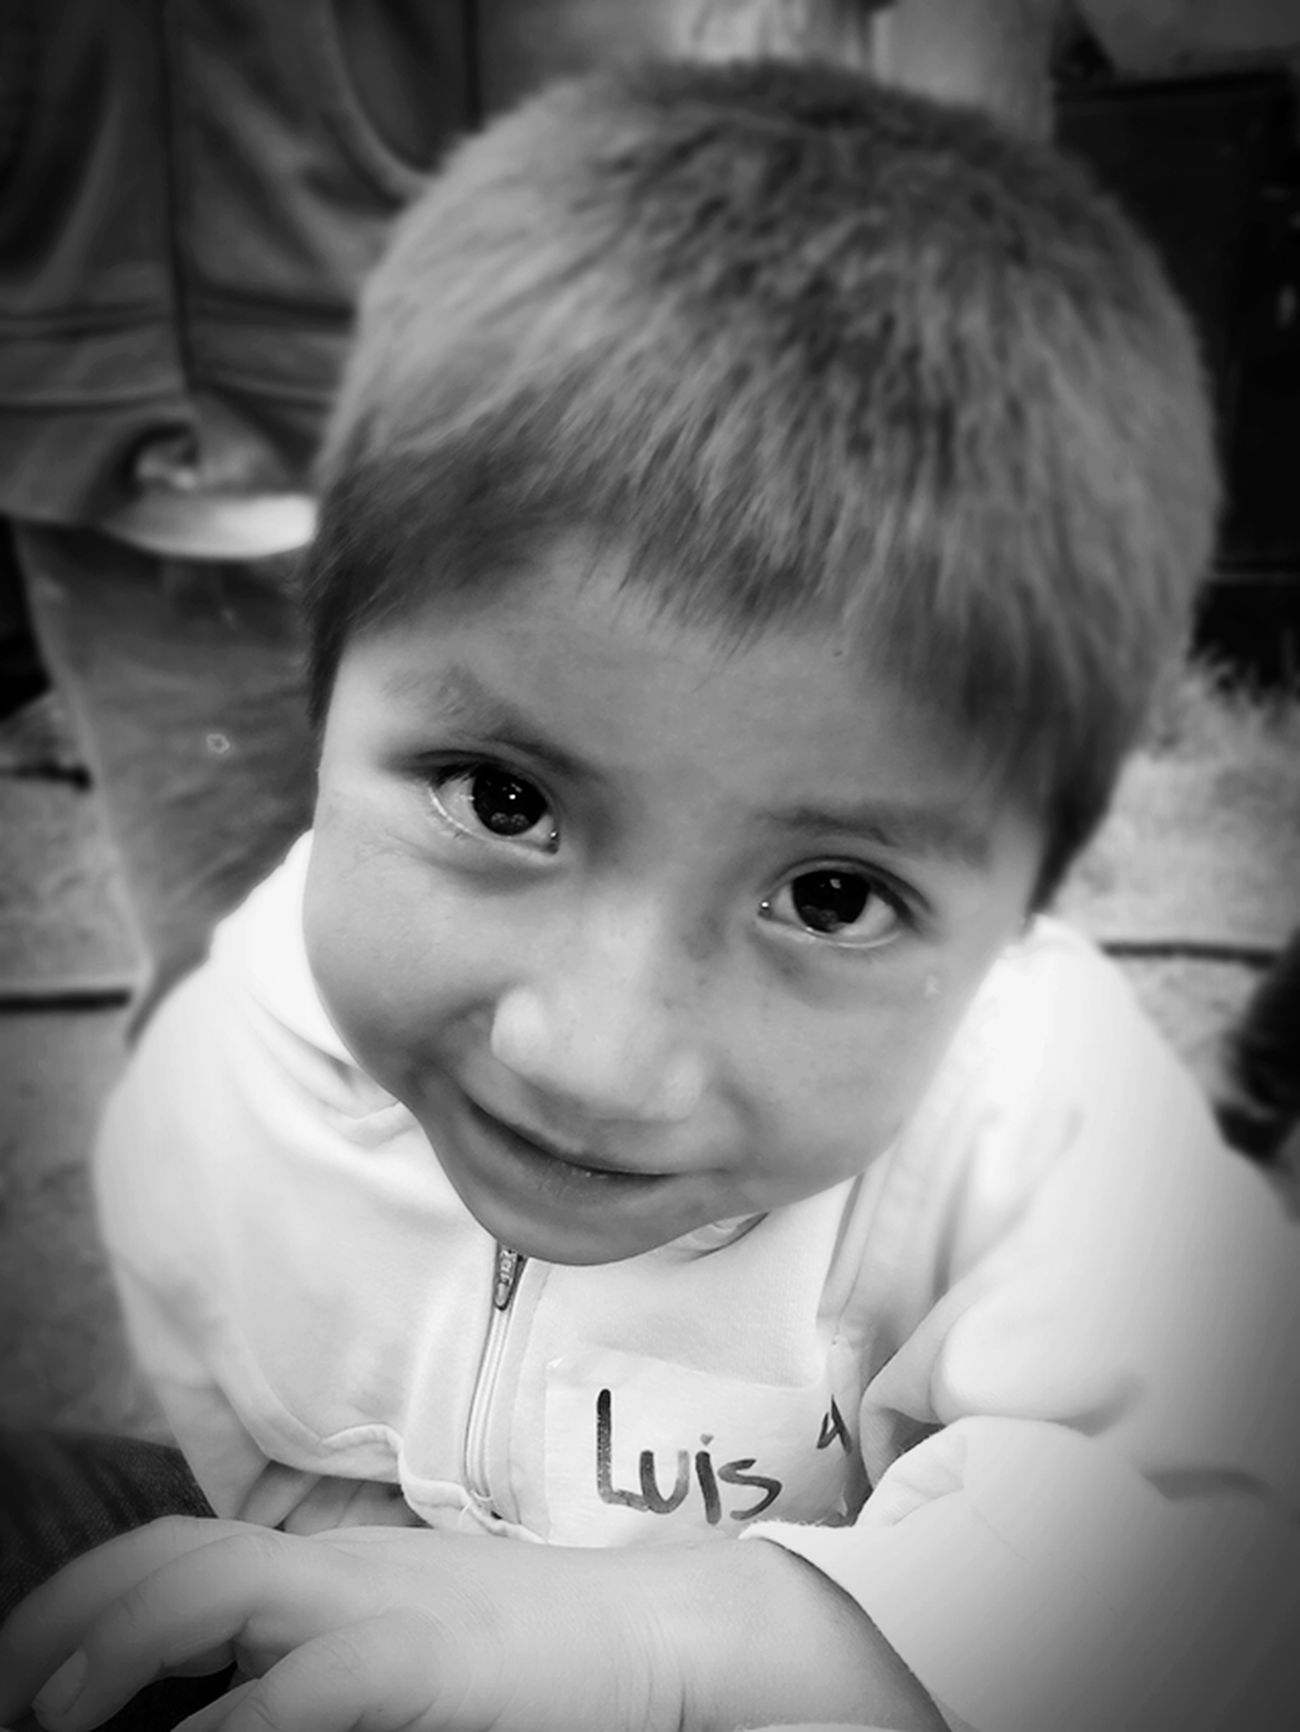 Luis God Boys